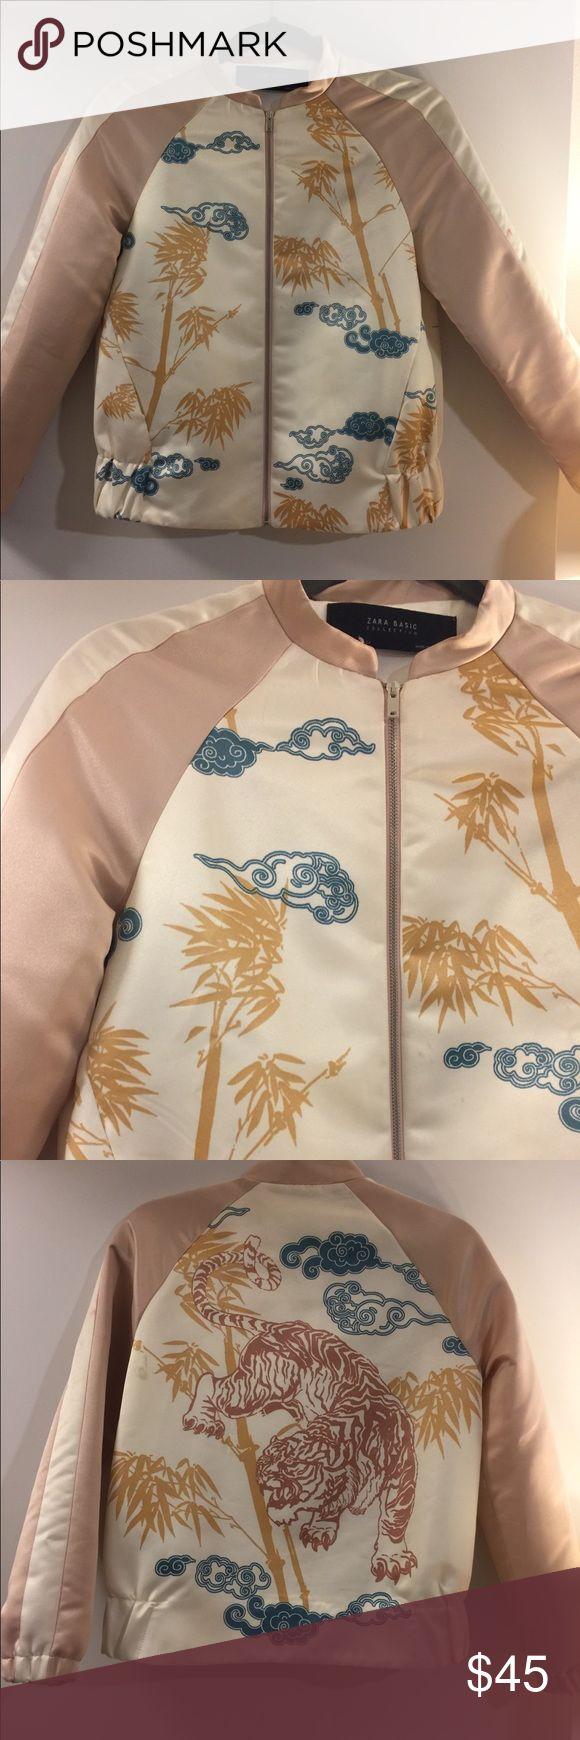 Zara Bomber jacket Zara light pink and white jacket. Little stain on one sleeve. Zipper close. Side pockets. Lightweight. OFFERS ACCEPTED Zara Jackets & Coats Puffers